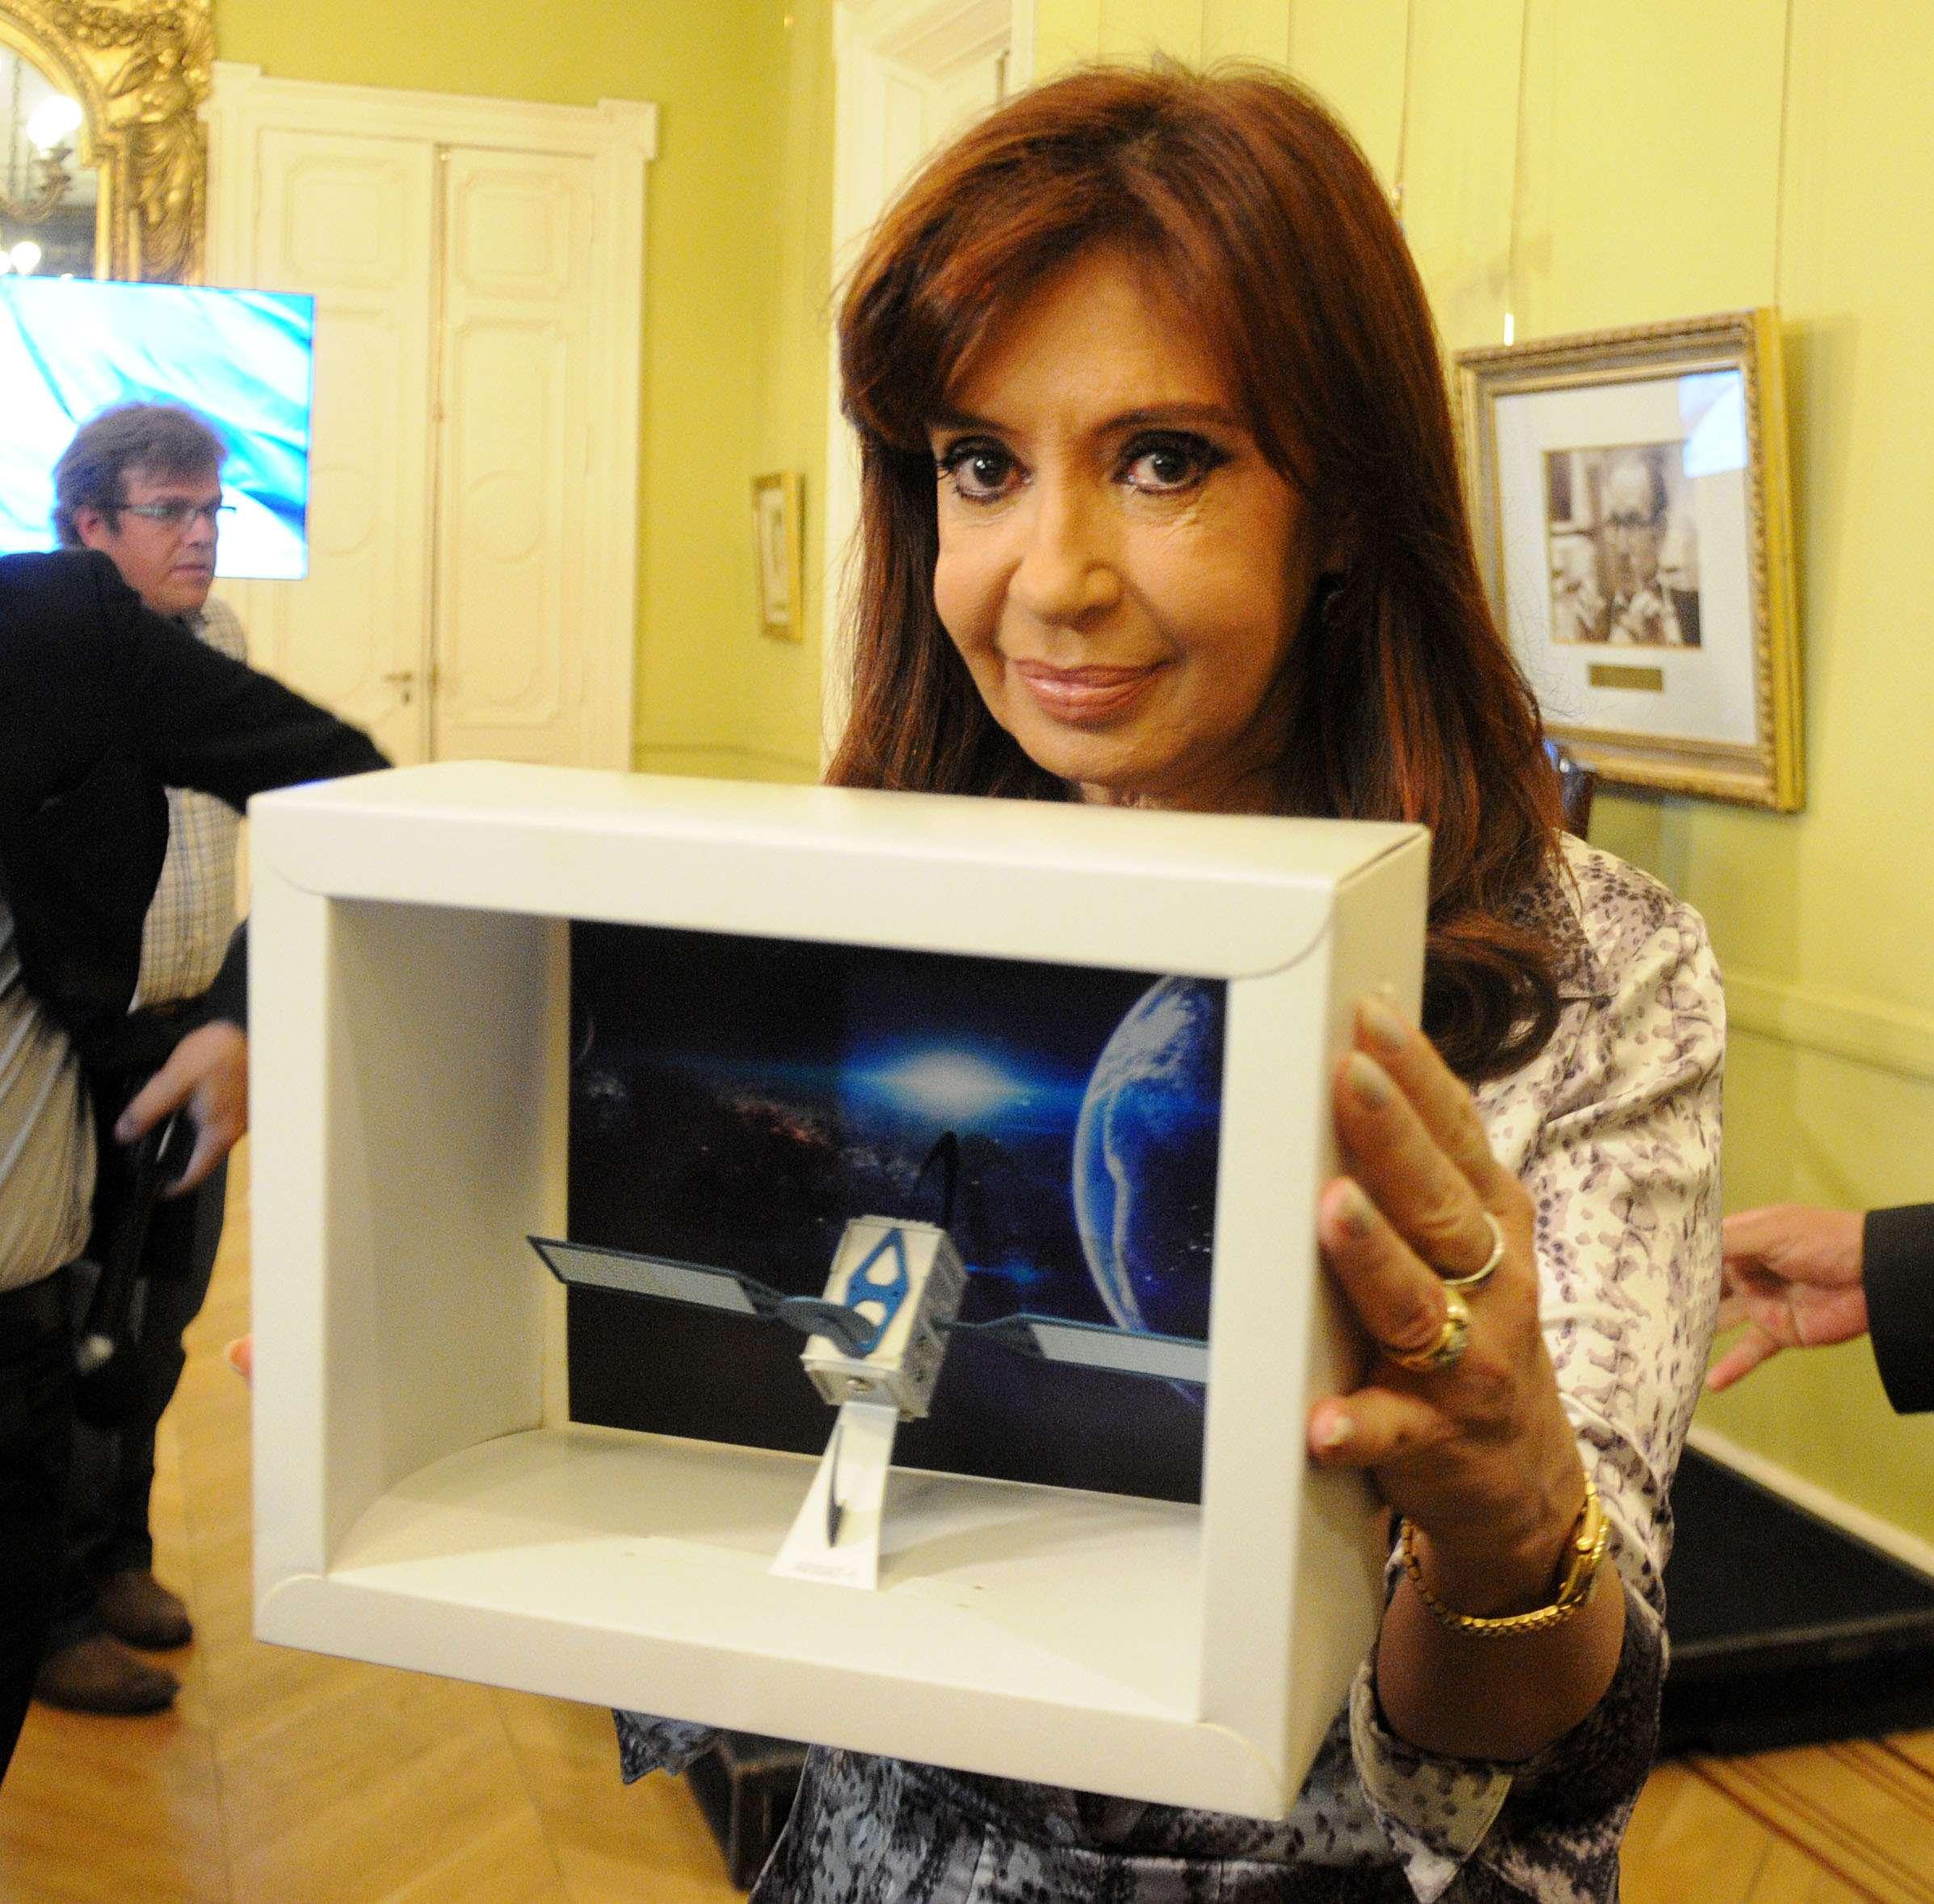 La presidenta Cristina Kirchner Foto: NA